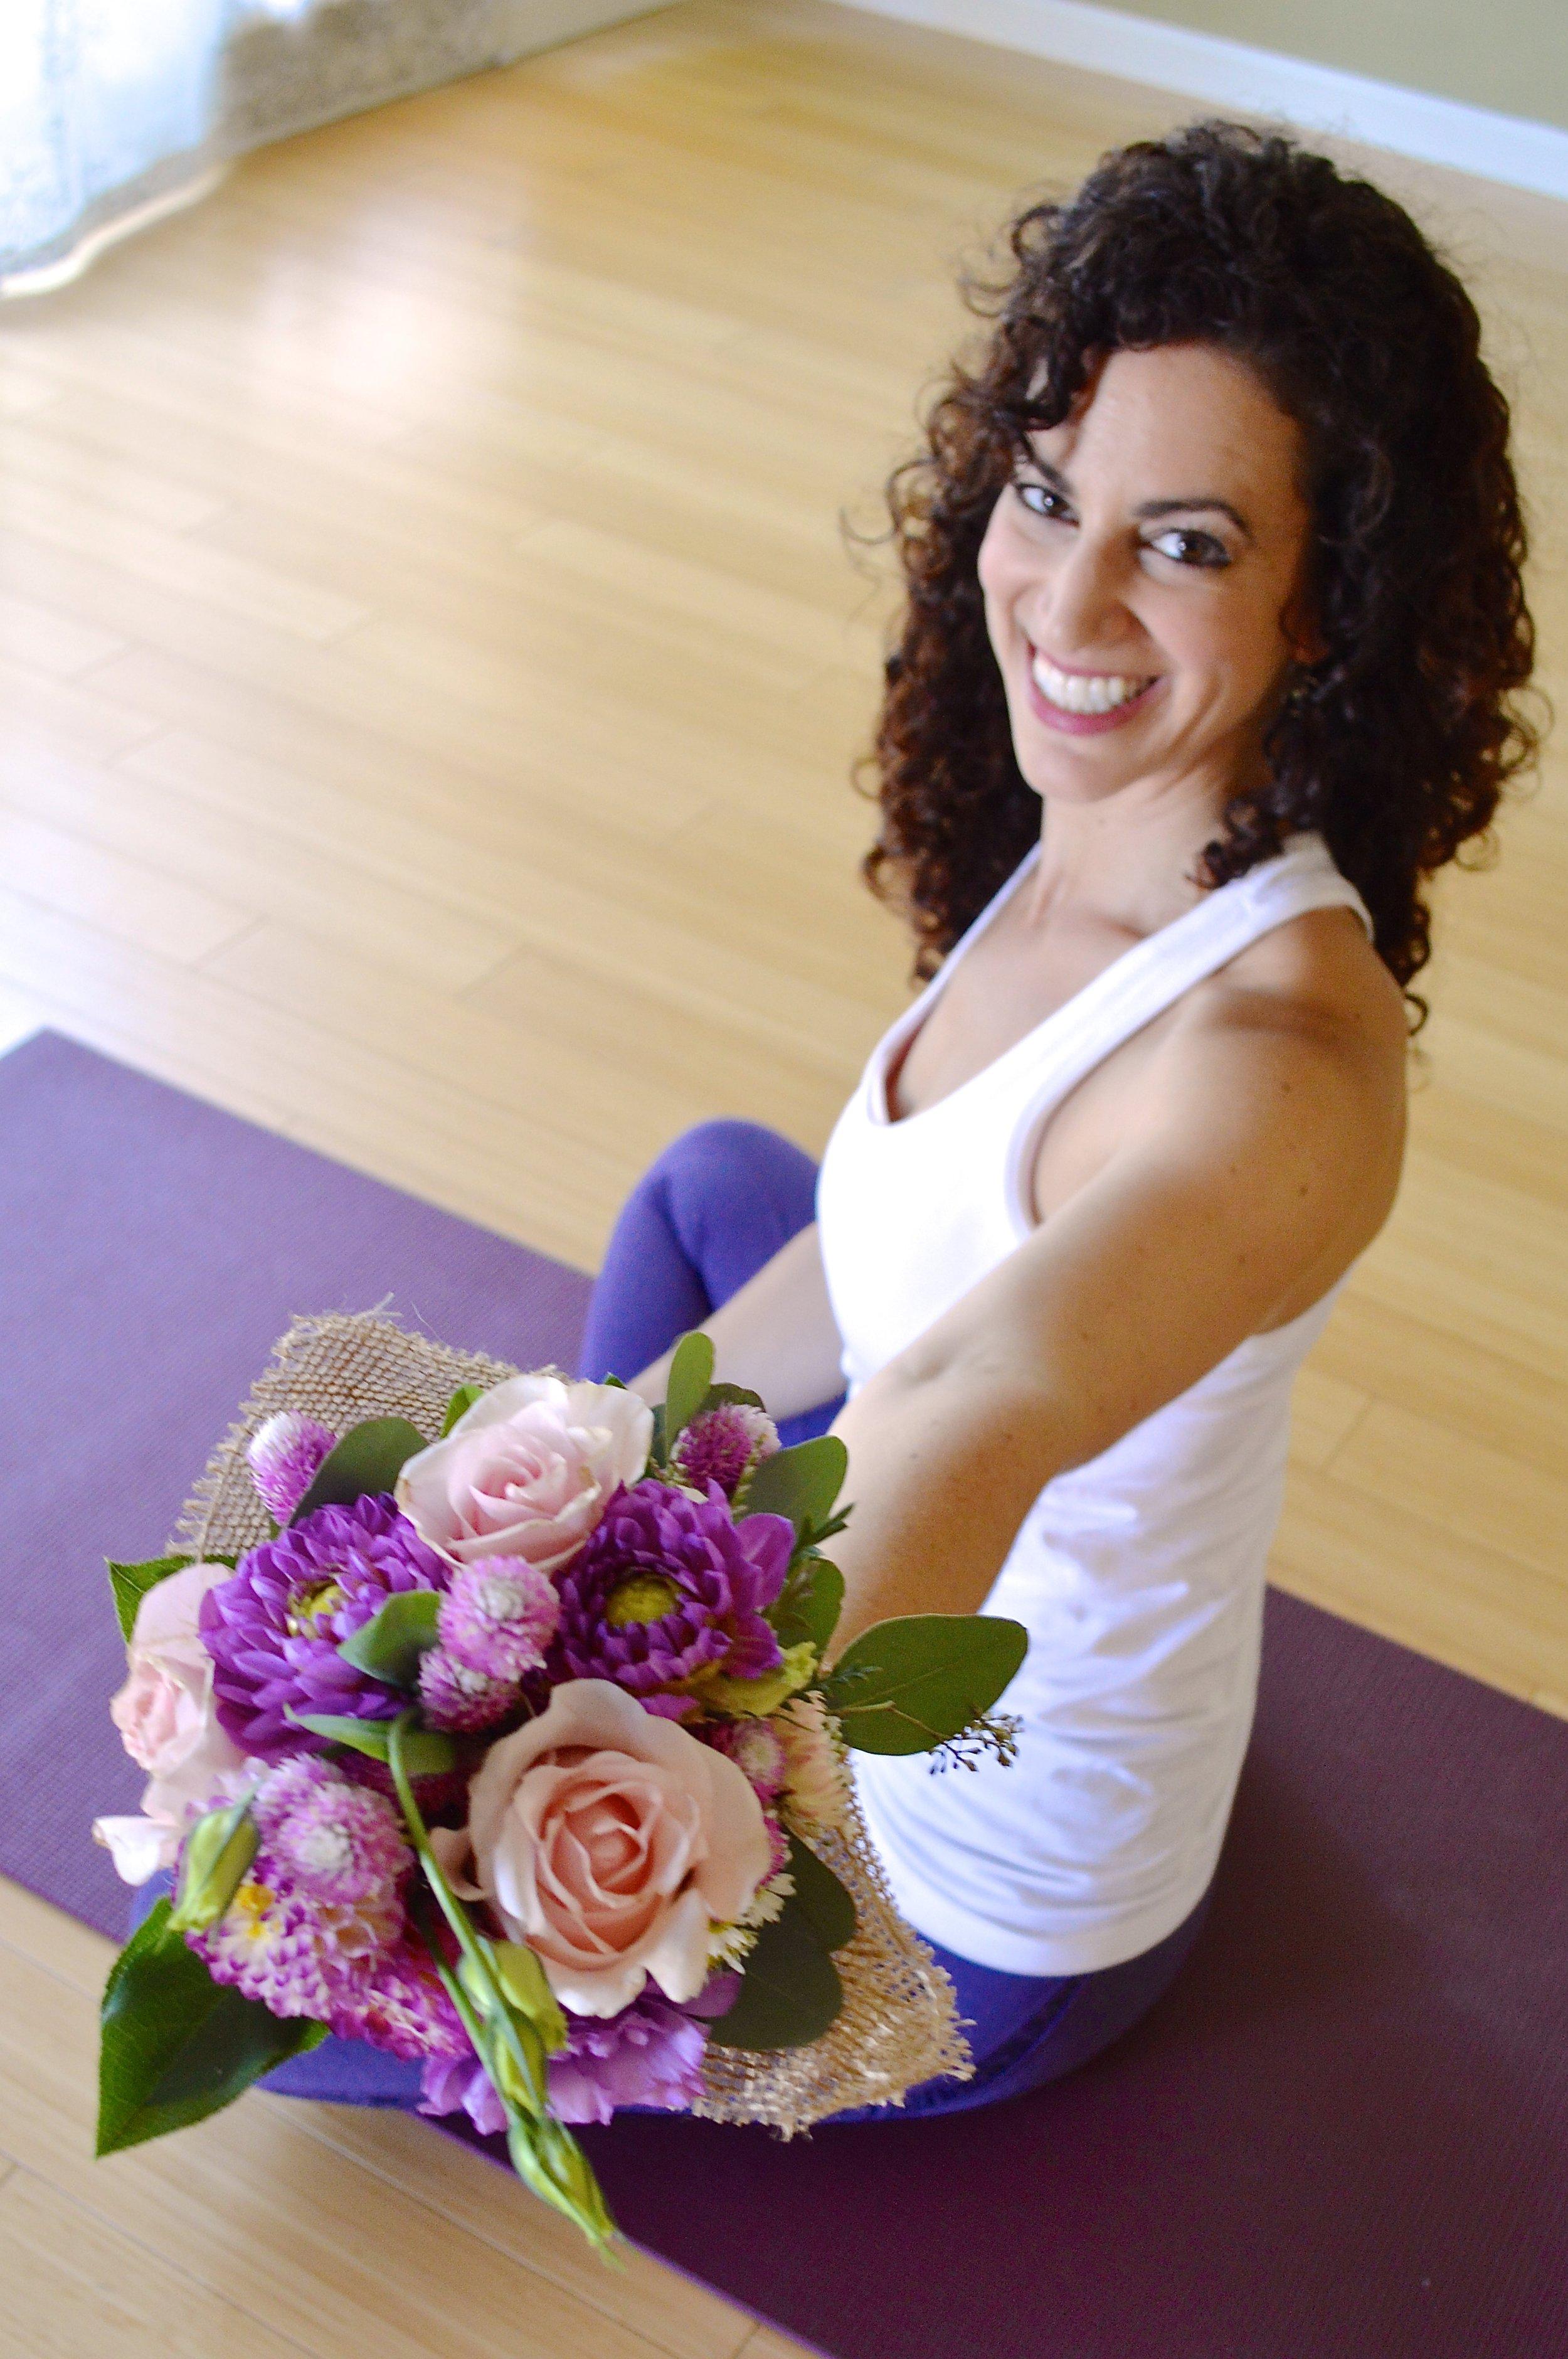 Wedding Wellness Program - 6 weeks of customized Yoga & Meditation practices, plus a personalized Nutrition ProgramDesigned by Robin Wilner…The Nutritious Yogini!